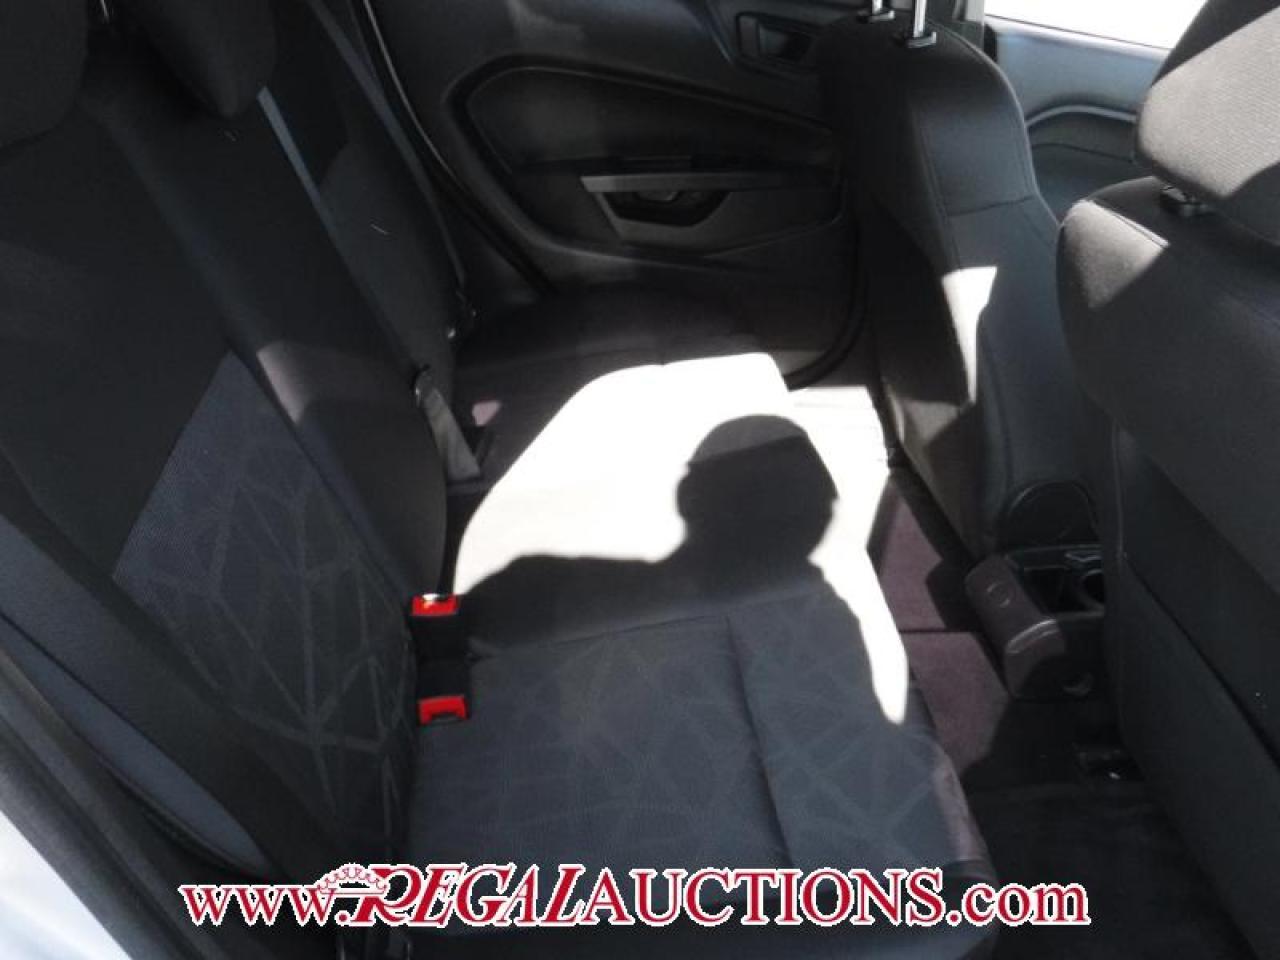 2011 Ford FIESTA SEE 4D HATCHBACK